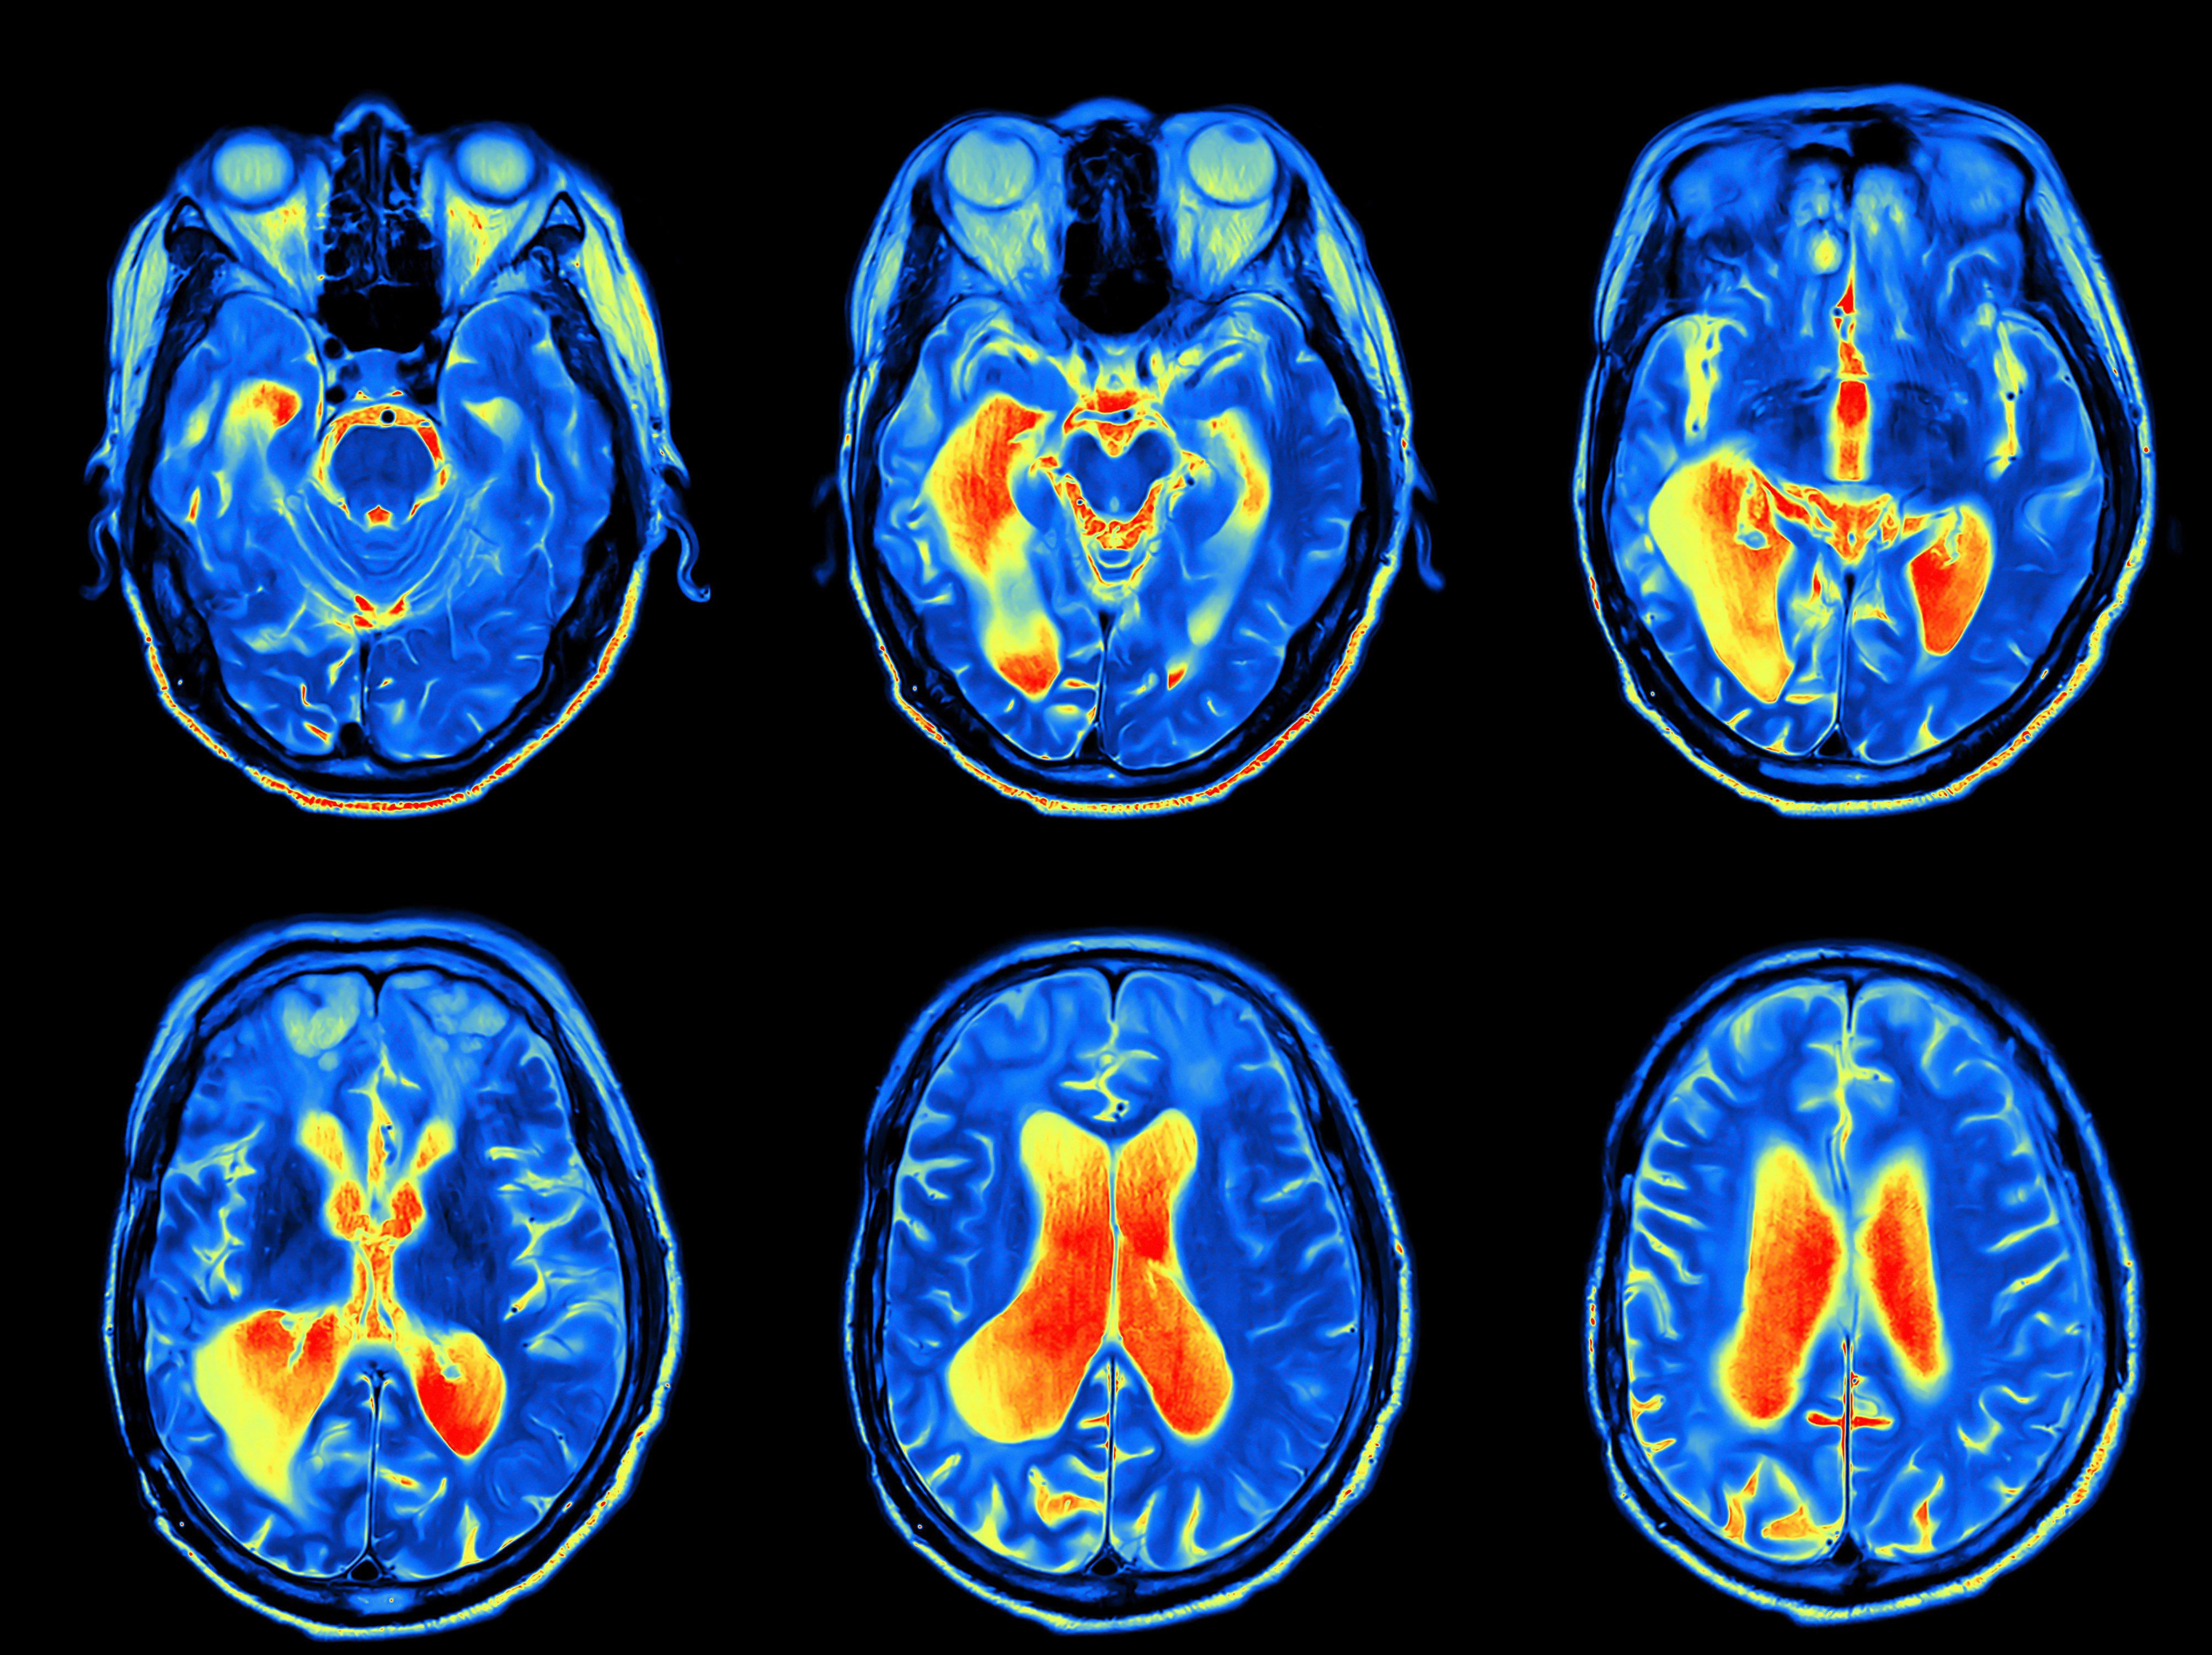 MRI scan image of brain